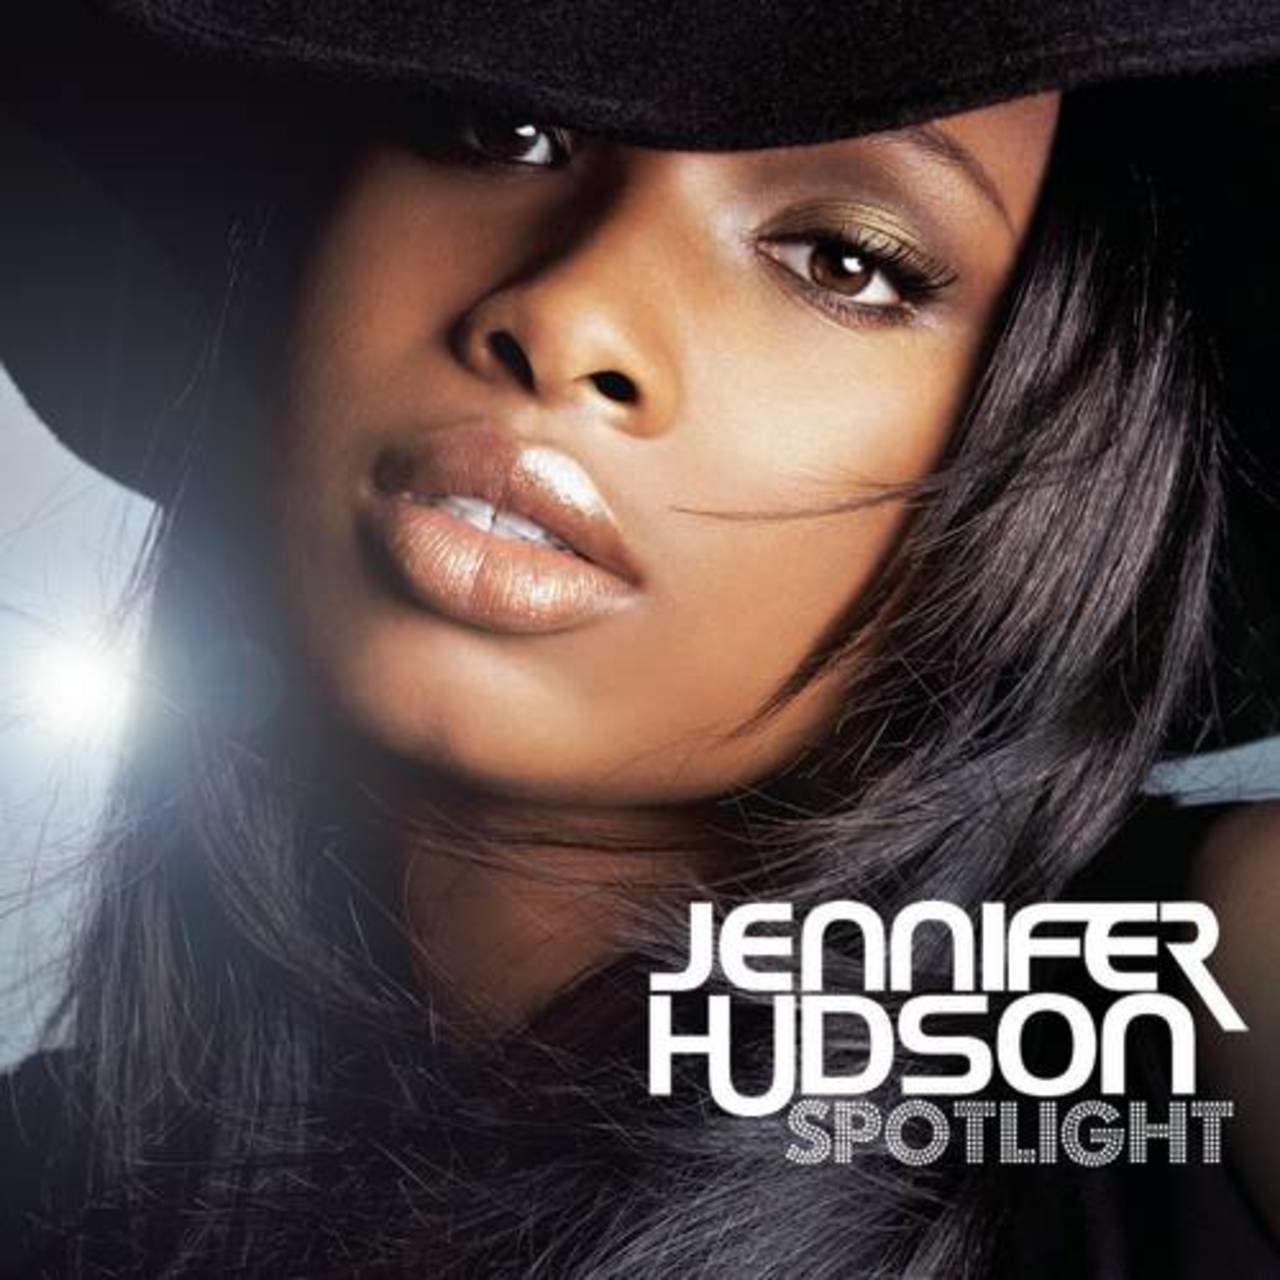 Jennifer Hudson – Spotlight (single cover art)